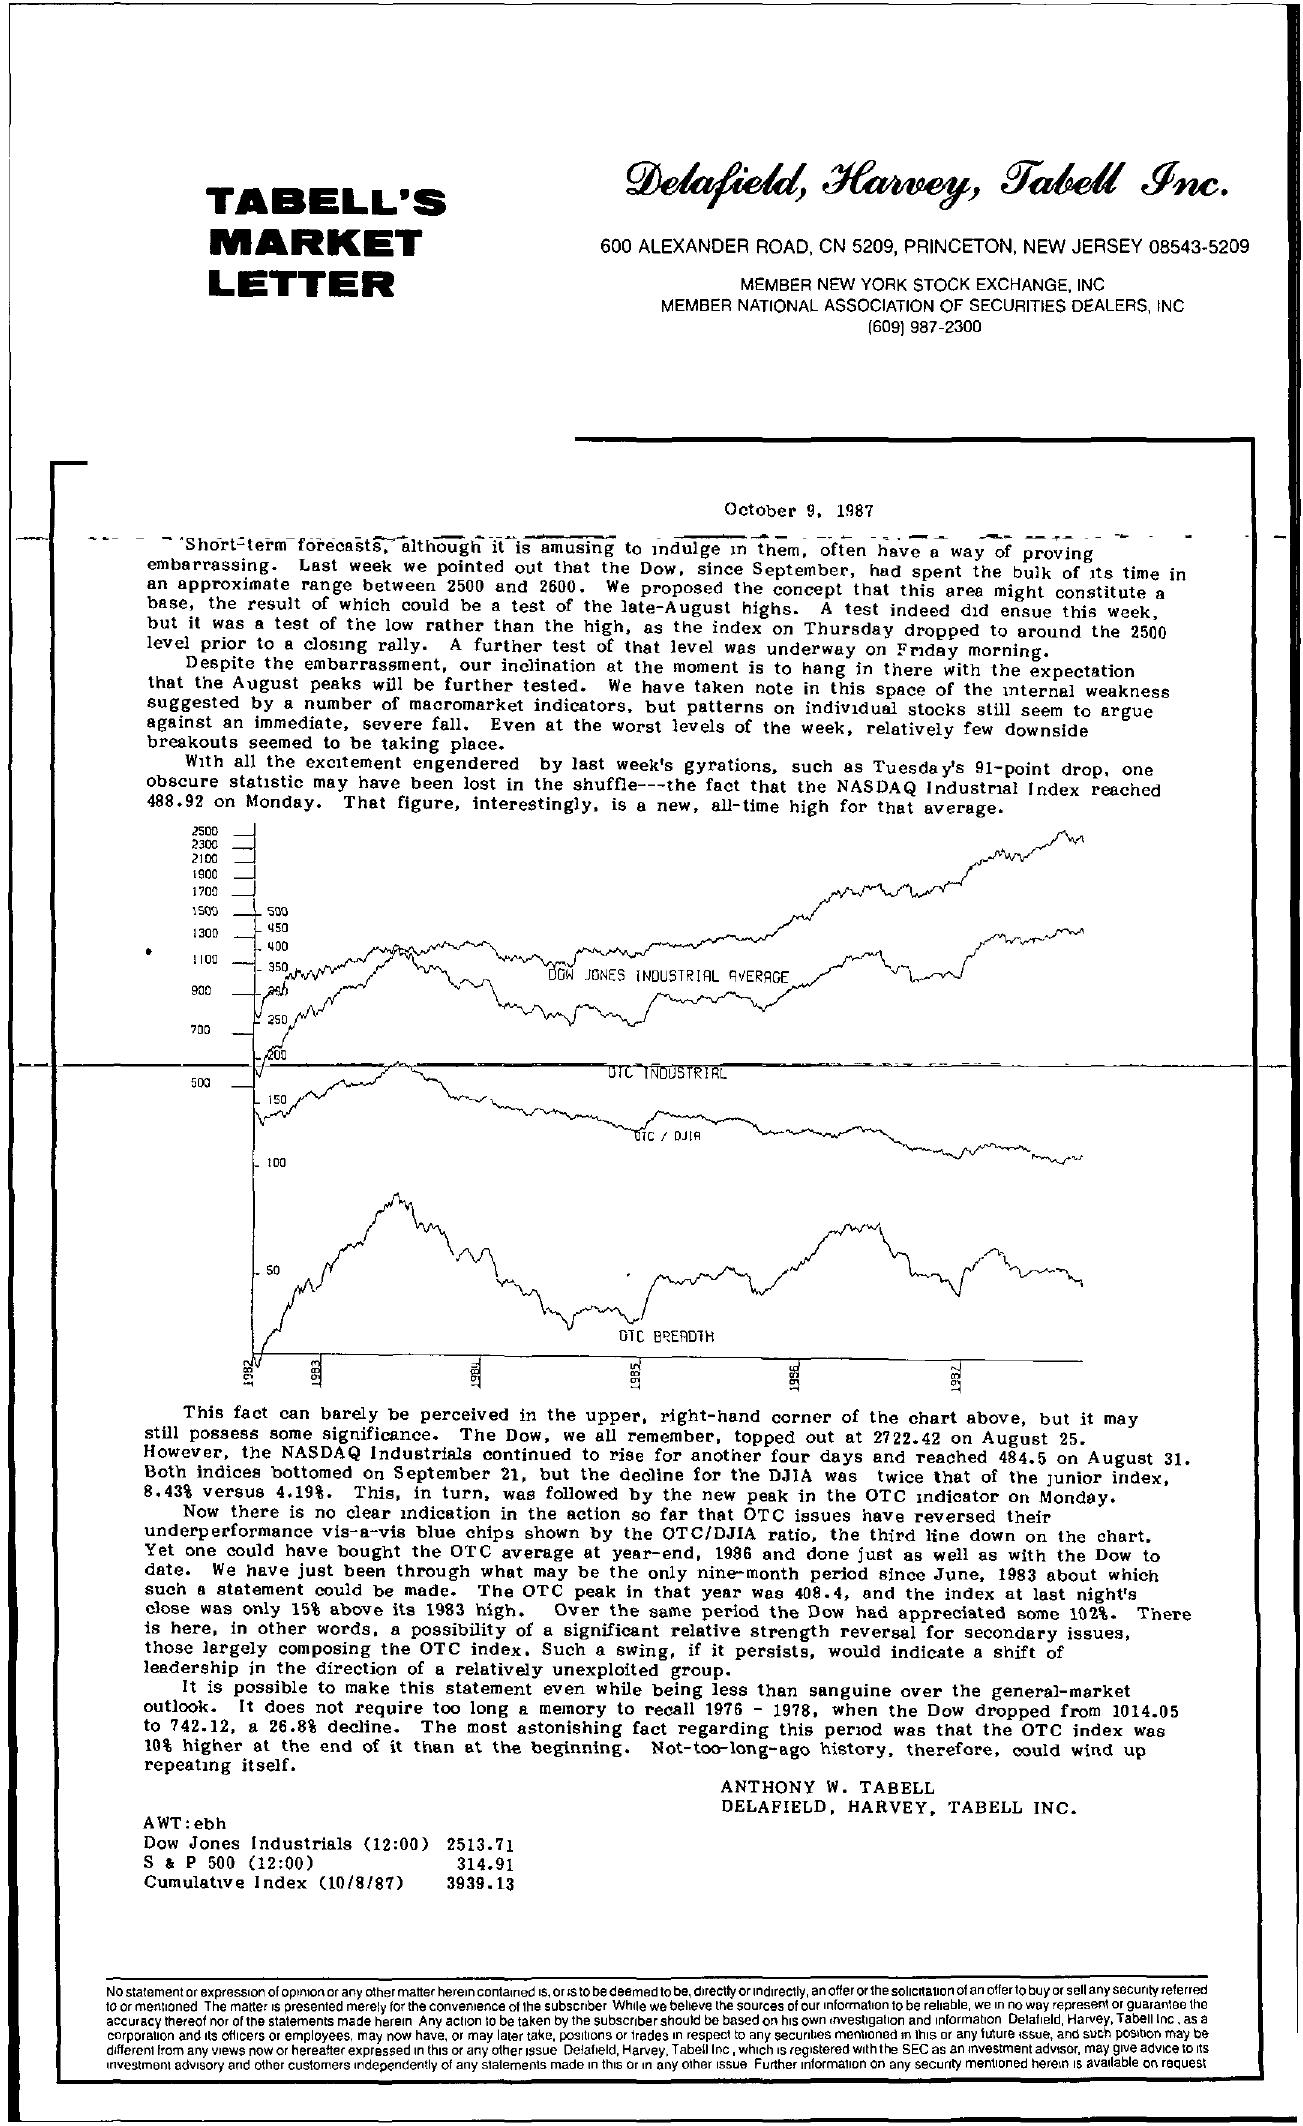 Tabell's Market Letter - October 09, 1987